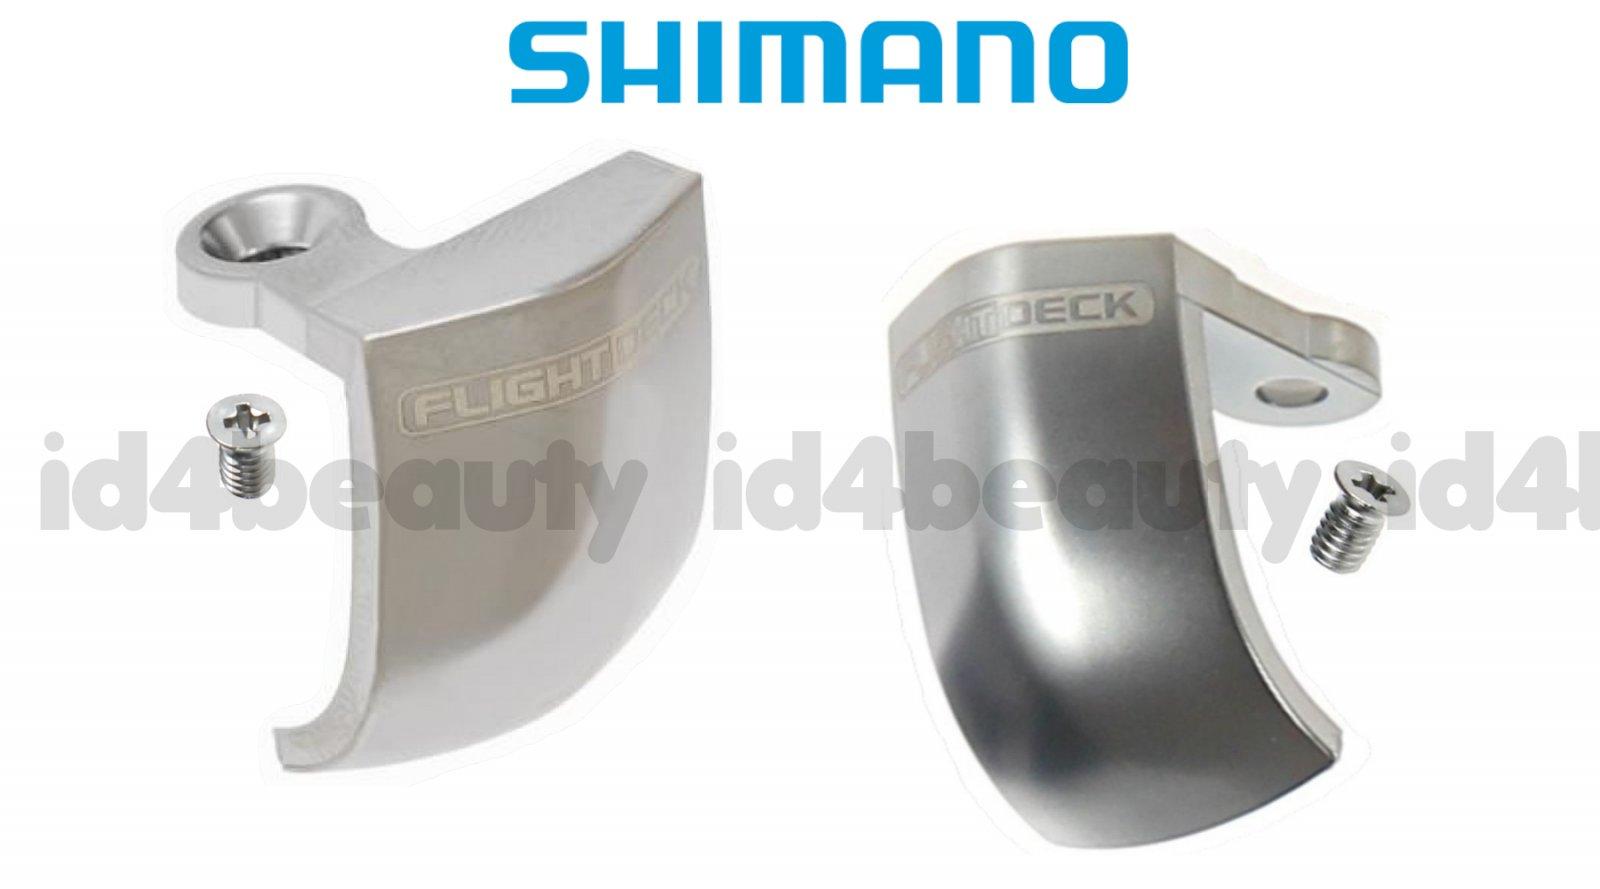 Shimano Ultegra ST-6800 Name Plate /& Fixing Screw Left /& Right NIB